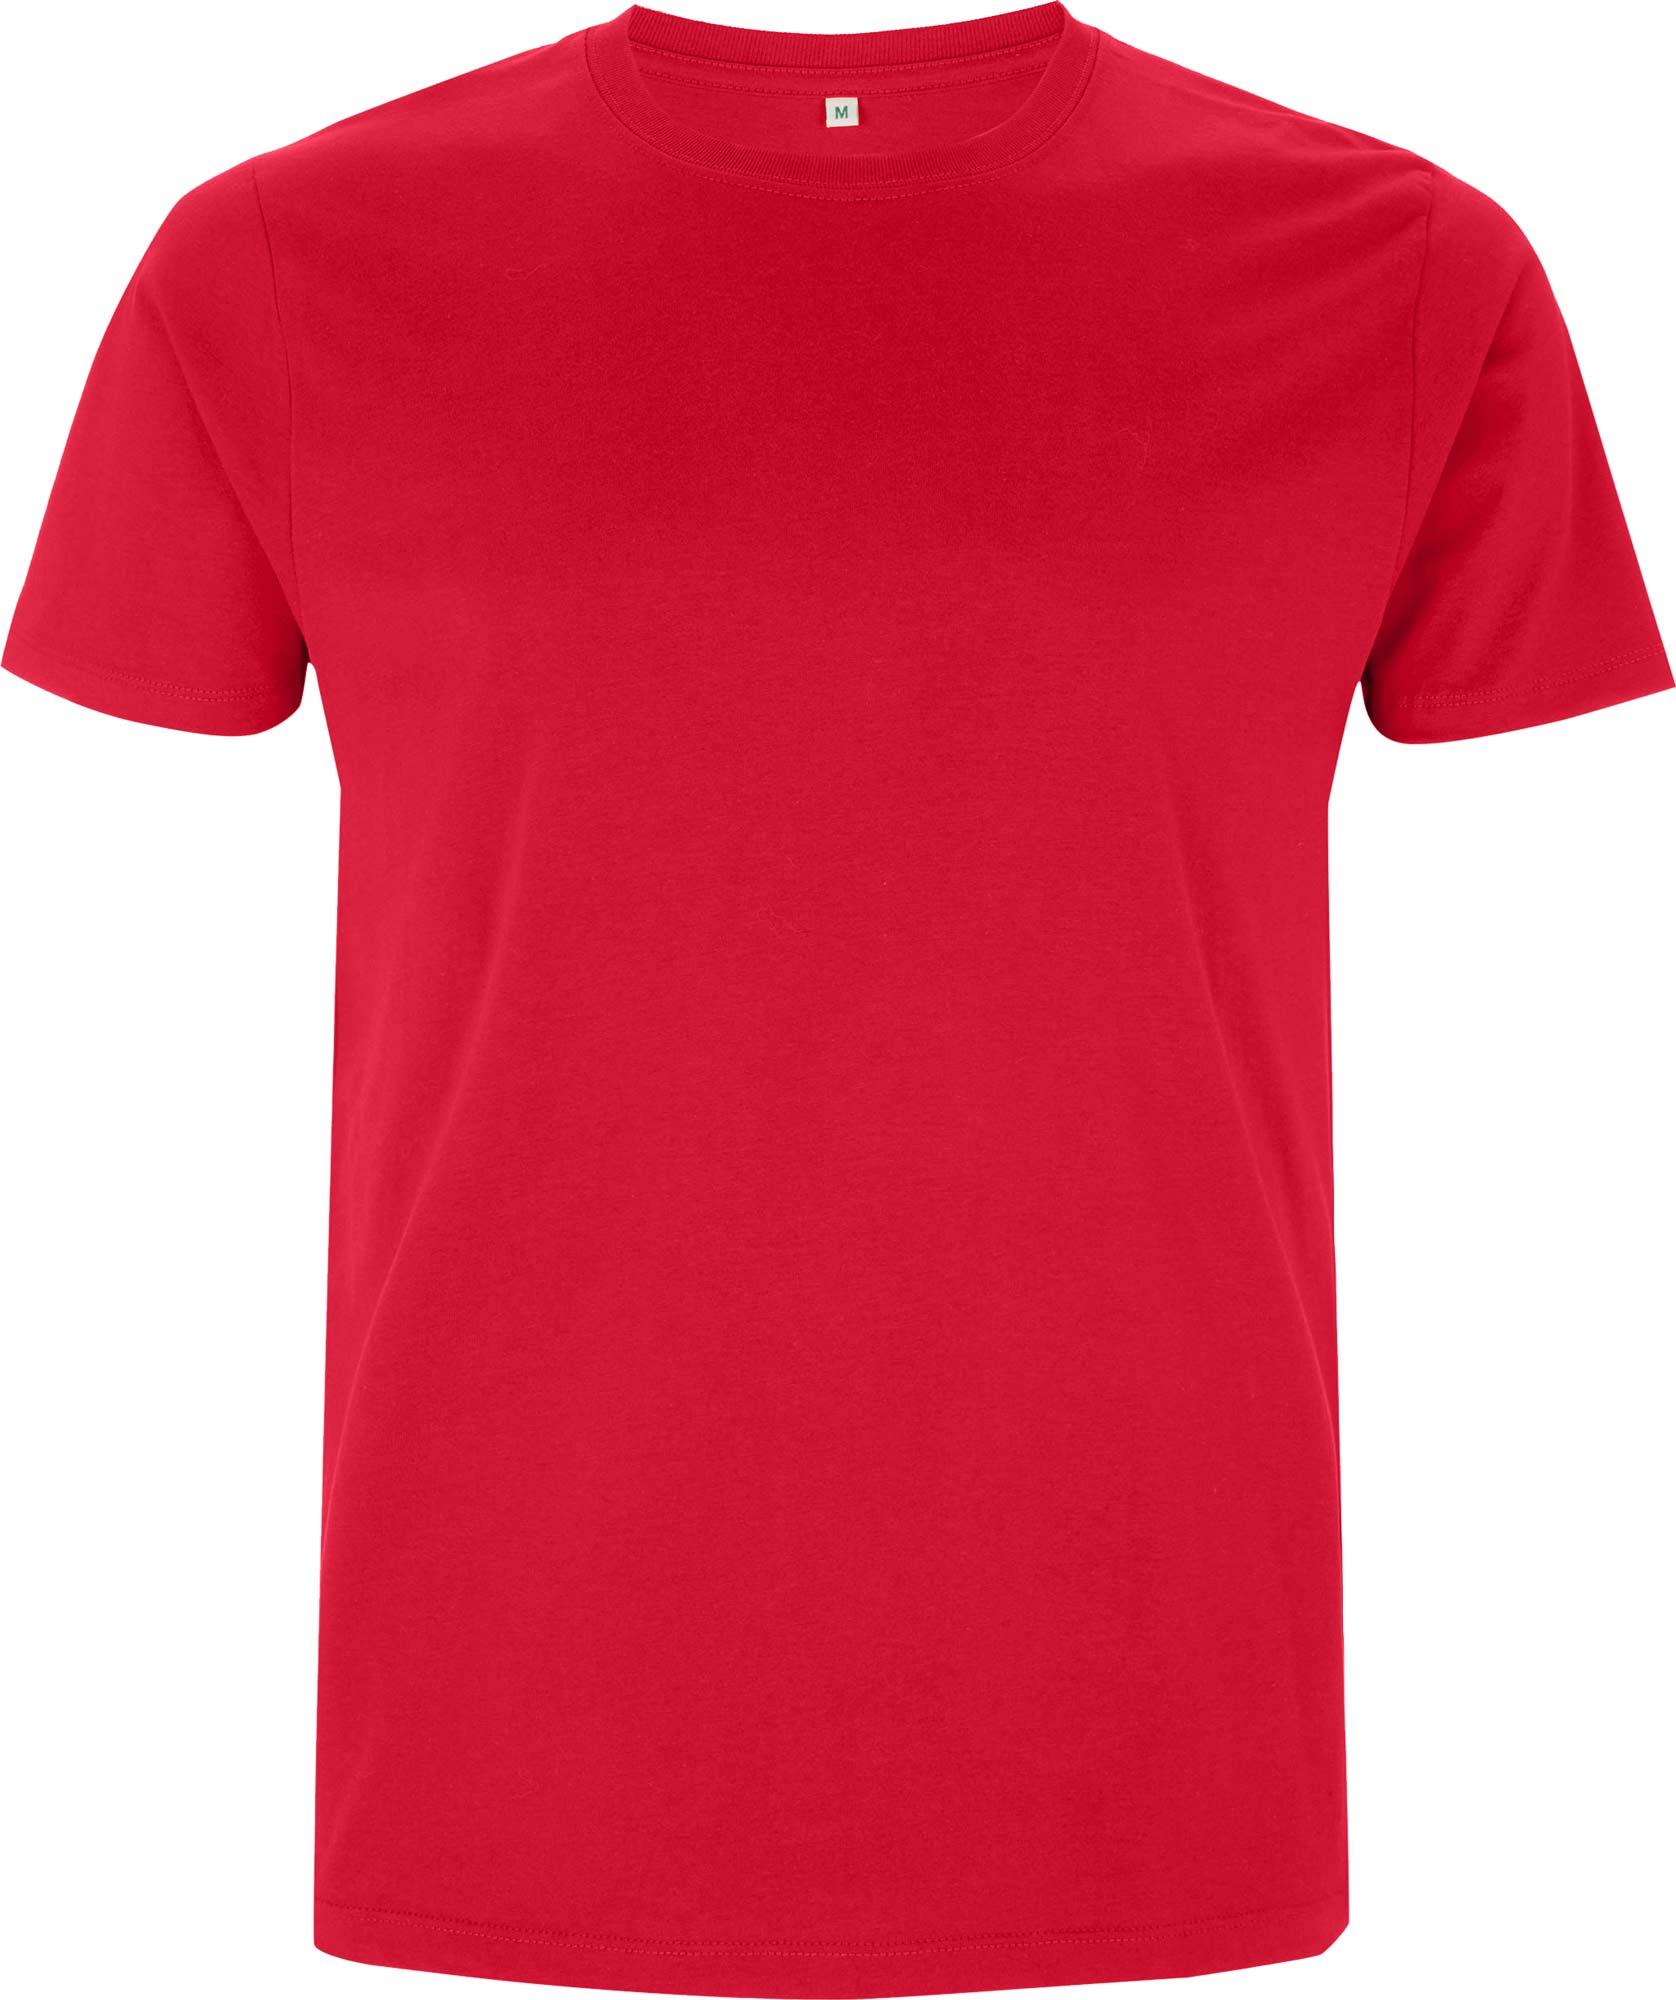 rotes fair trade t shirt aus bio baumwolle. Black Bedroom Furniture Sets. Home Design Ideas